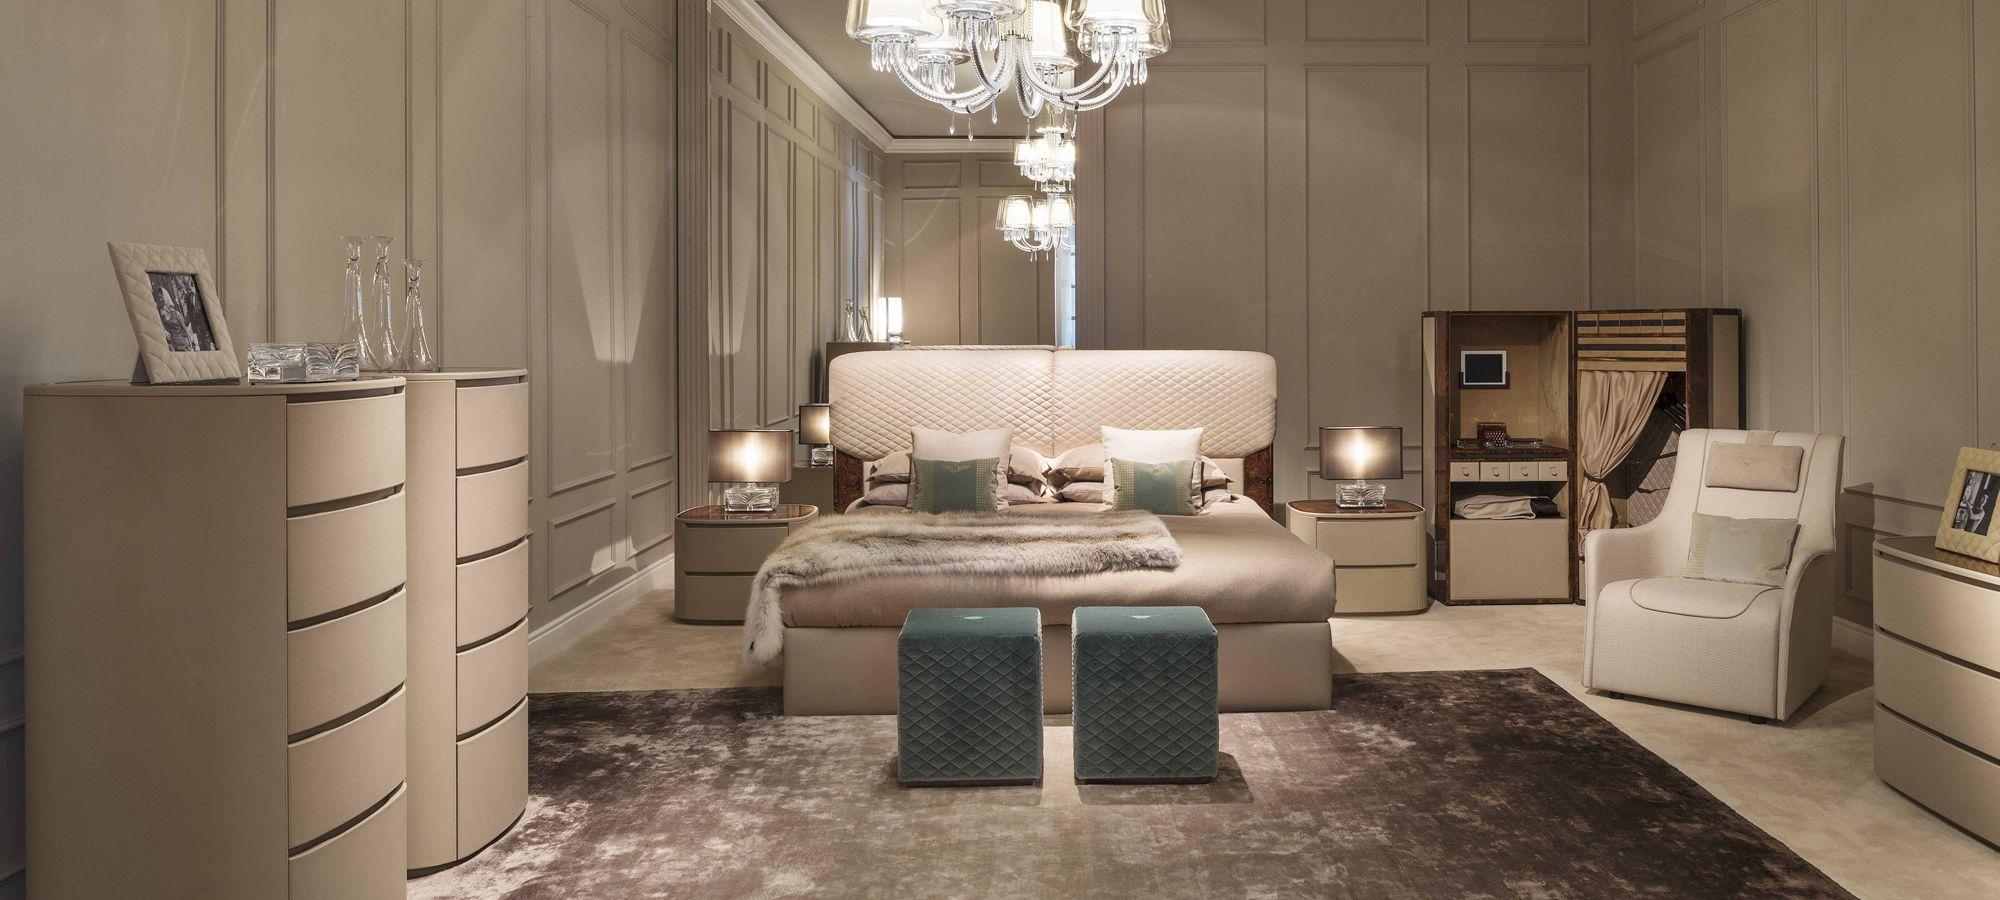 Berwick Bed Casarredo Luxury Furniture Brands Luxury Interior